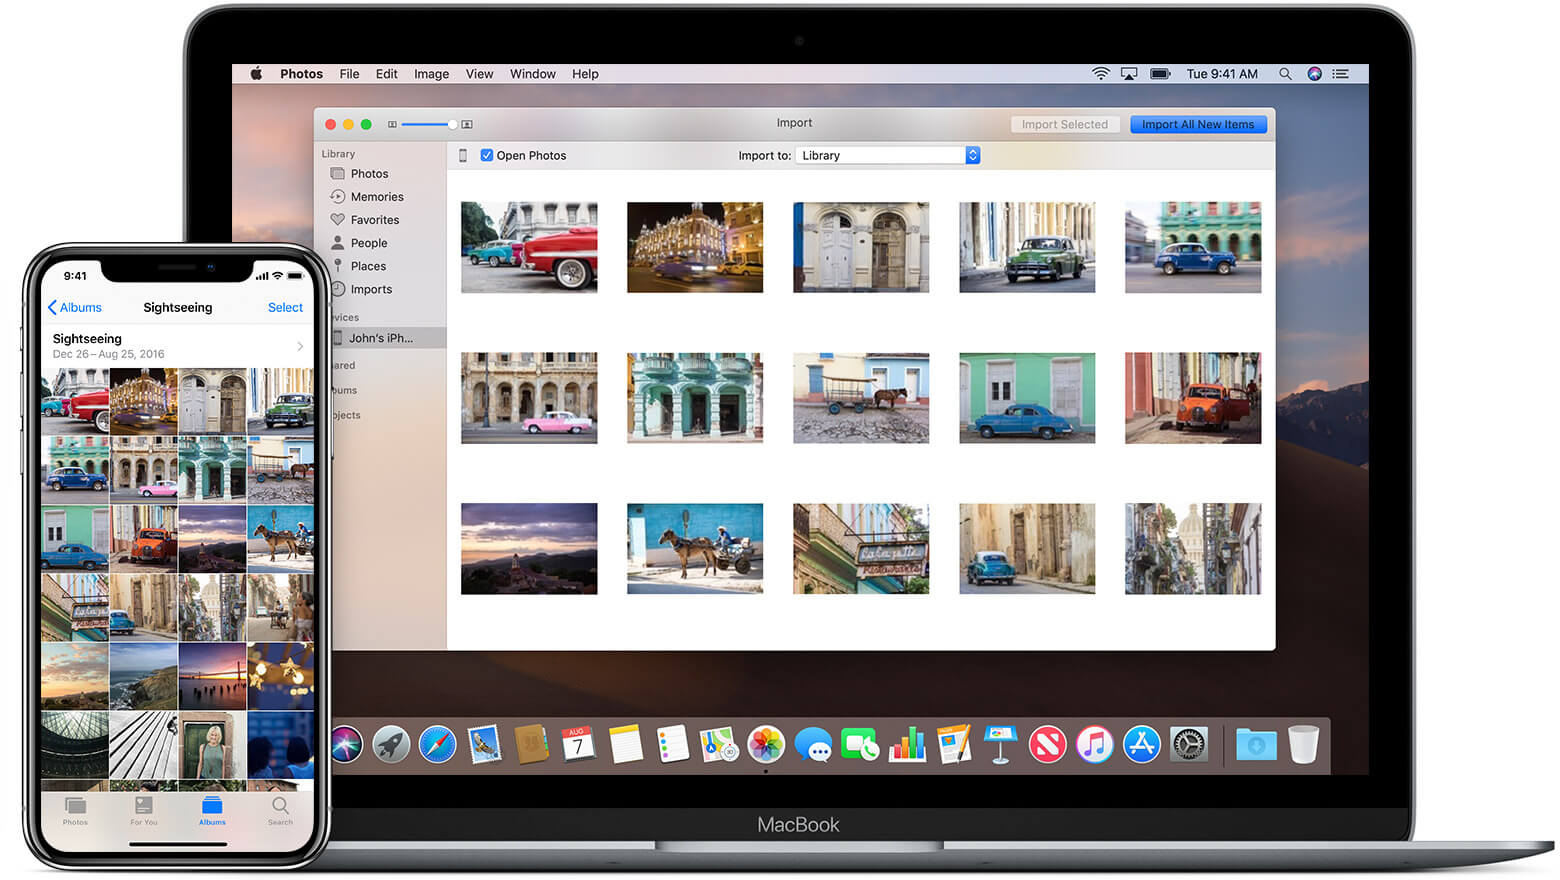 Macos mojave ios12 macbook iphone x transfer photos hero